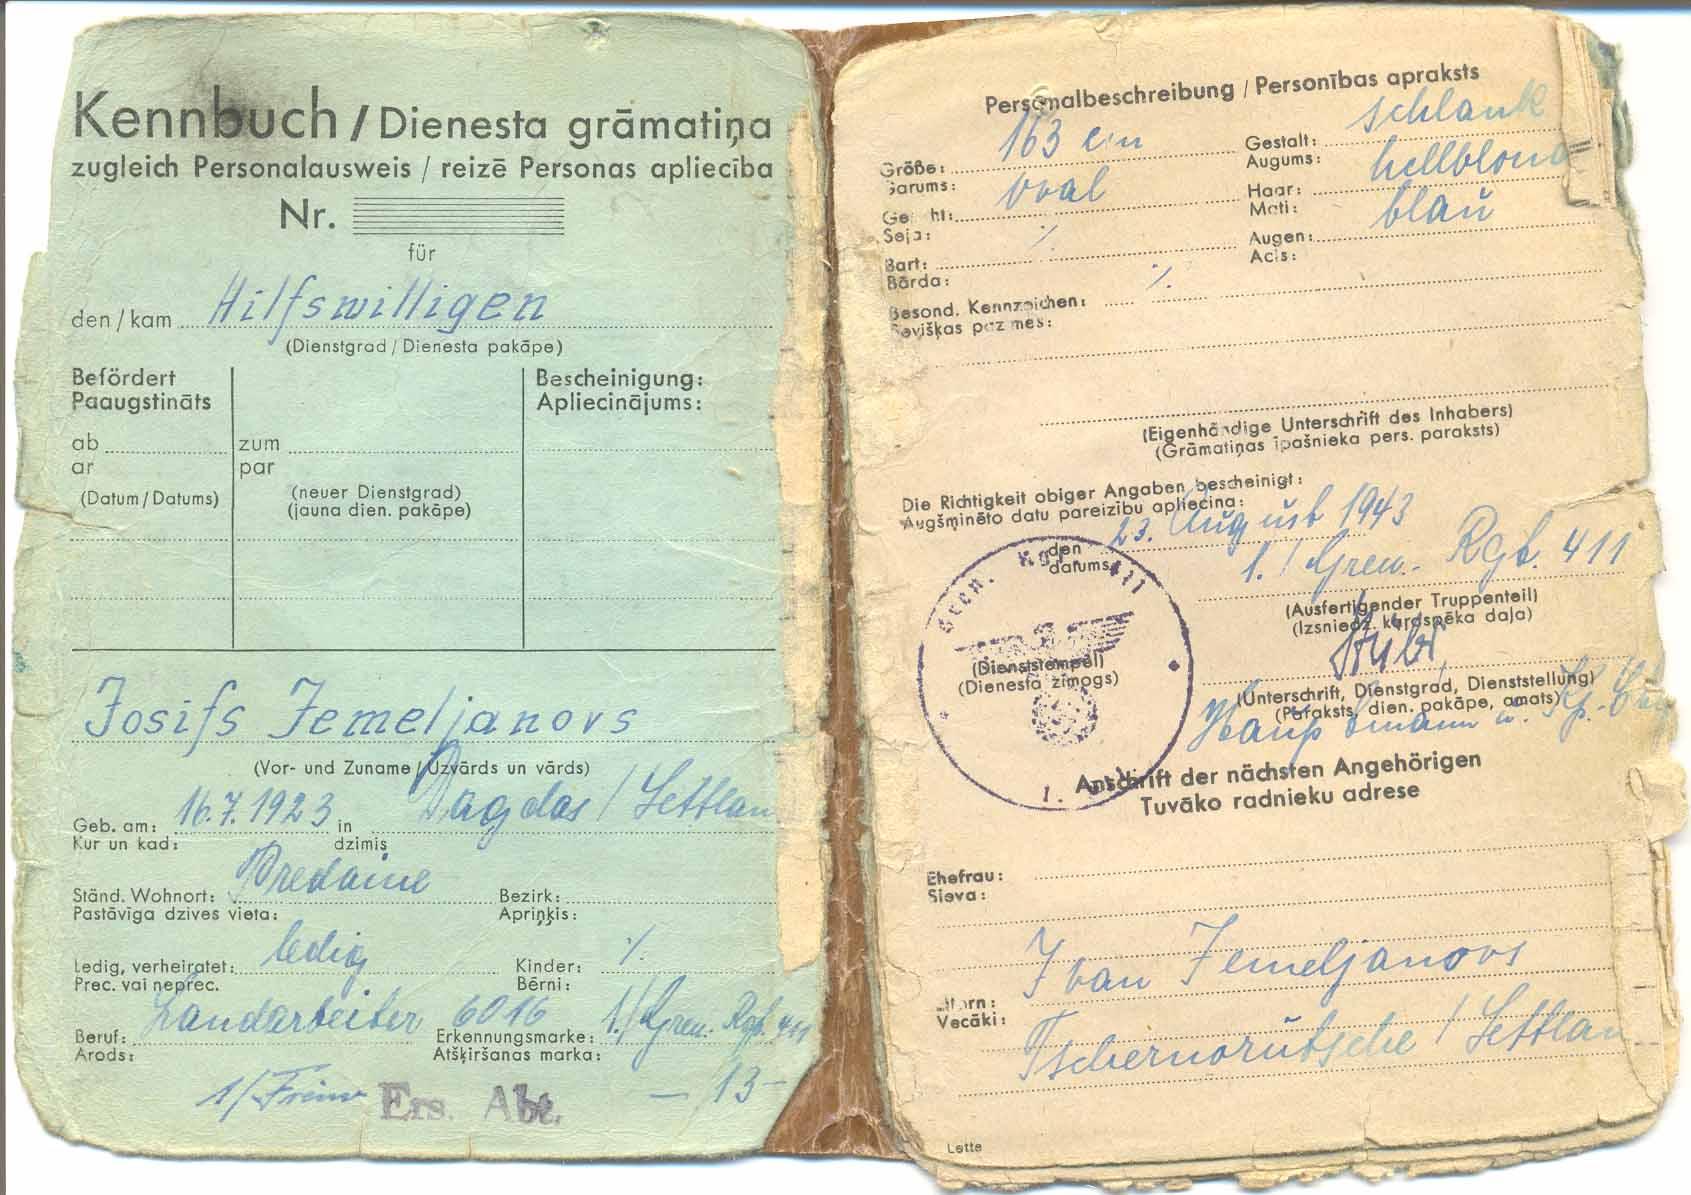 kennbuch k listu2.jpg